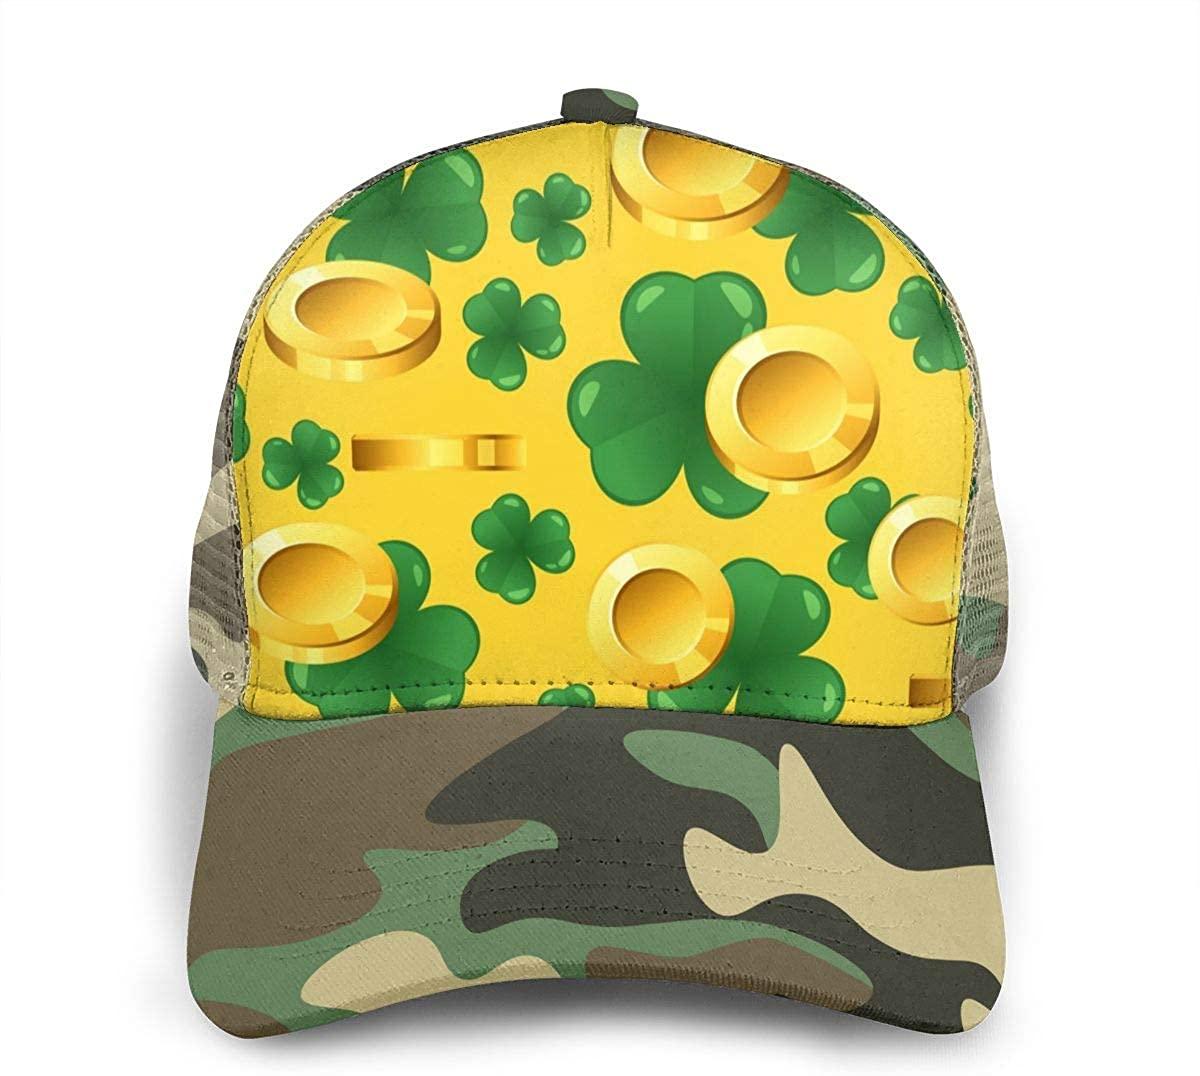 Snapback Hats for Men Women St. Patrick's Day Golden Coins Trucker Cap Hats Uv Sun Snapback Mesh Hat for Women Men Youth Teen